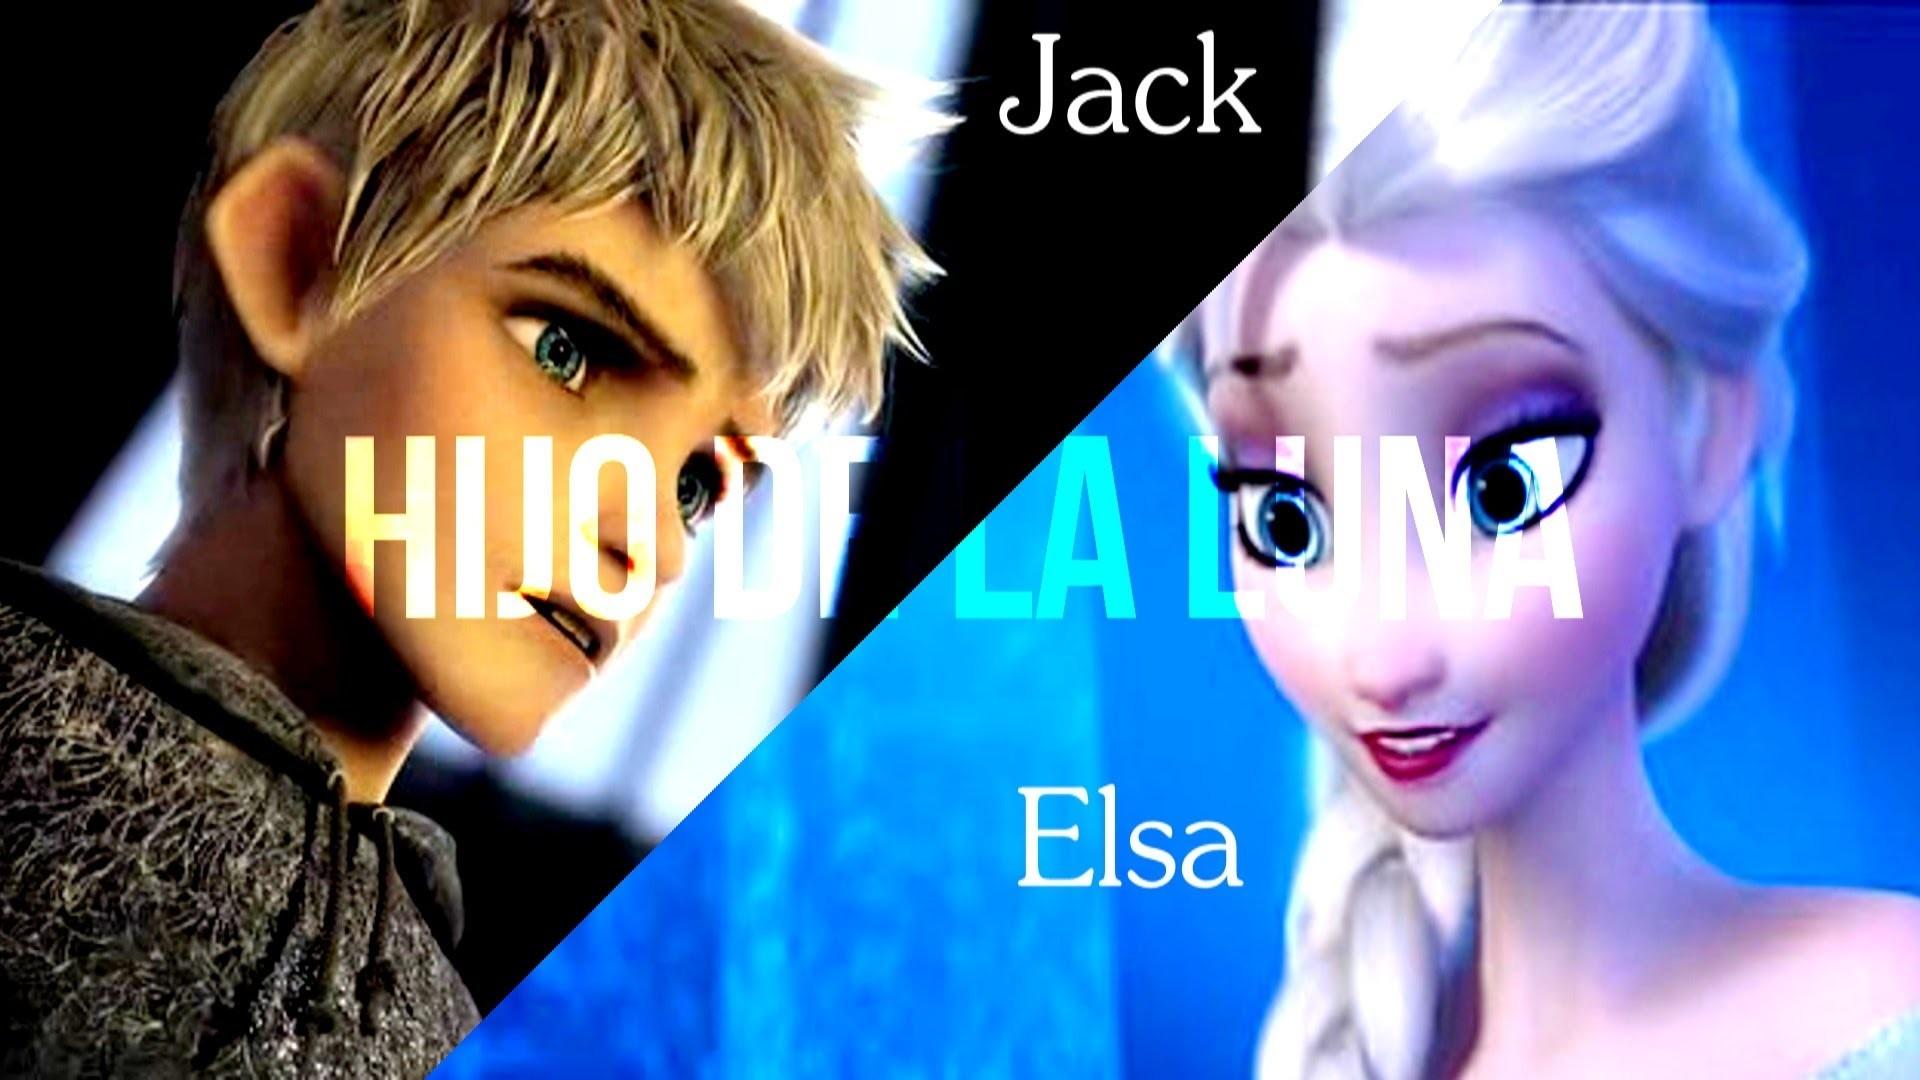 Jack Frost & Elsa – Hijo de la luna (Preview) + Update; Please read desc. –  YouTube